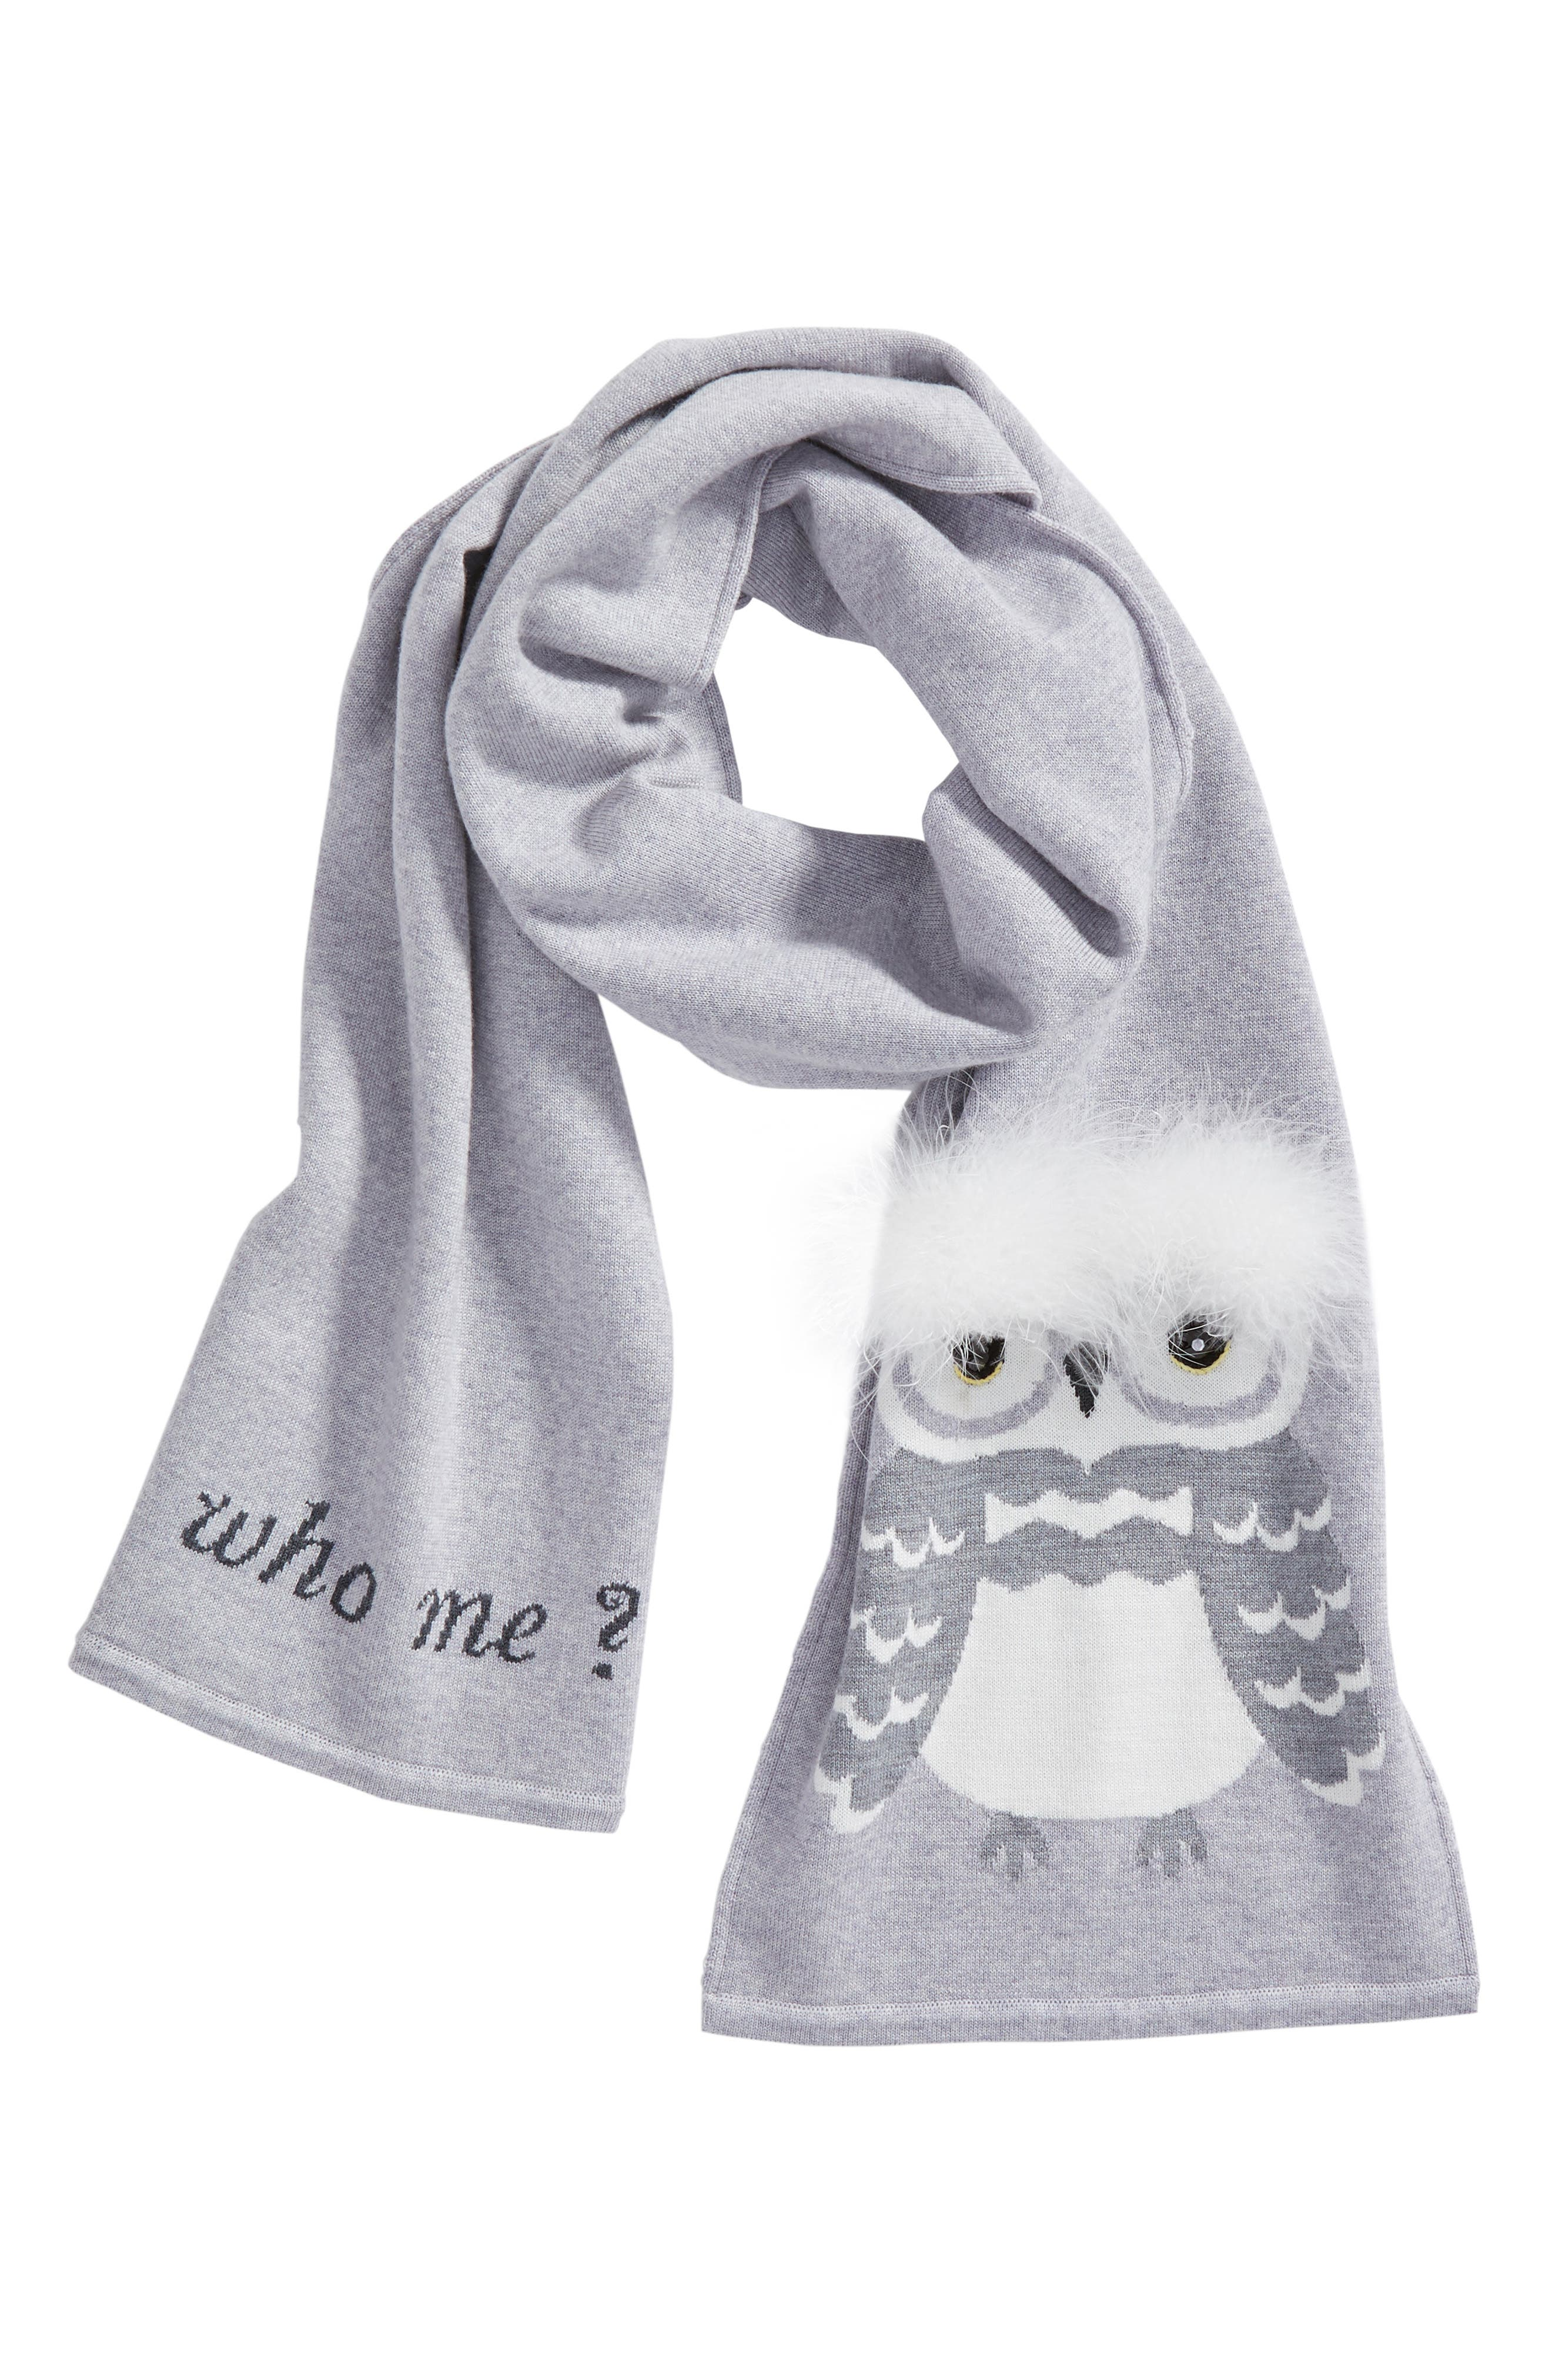 who me owl merino wool muffler,                             Alternate thumbnail 2, color,                             025